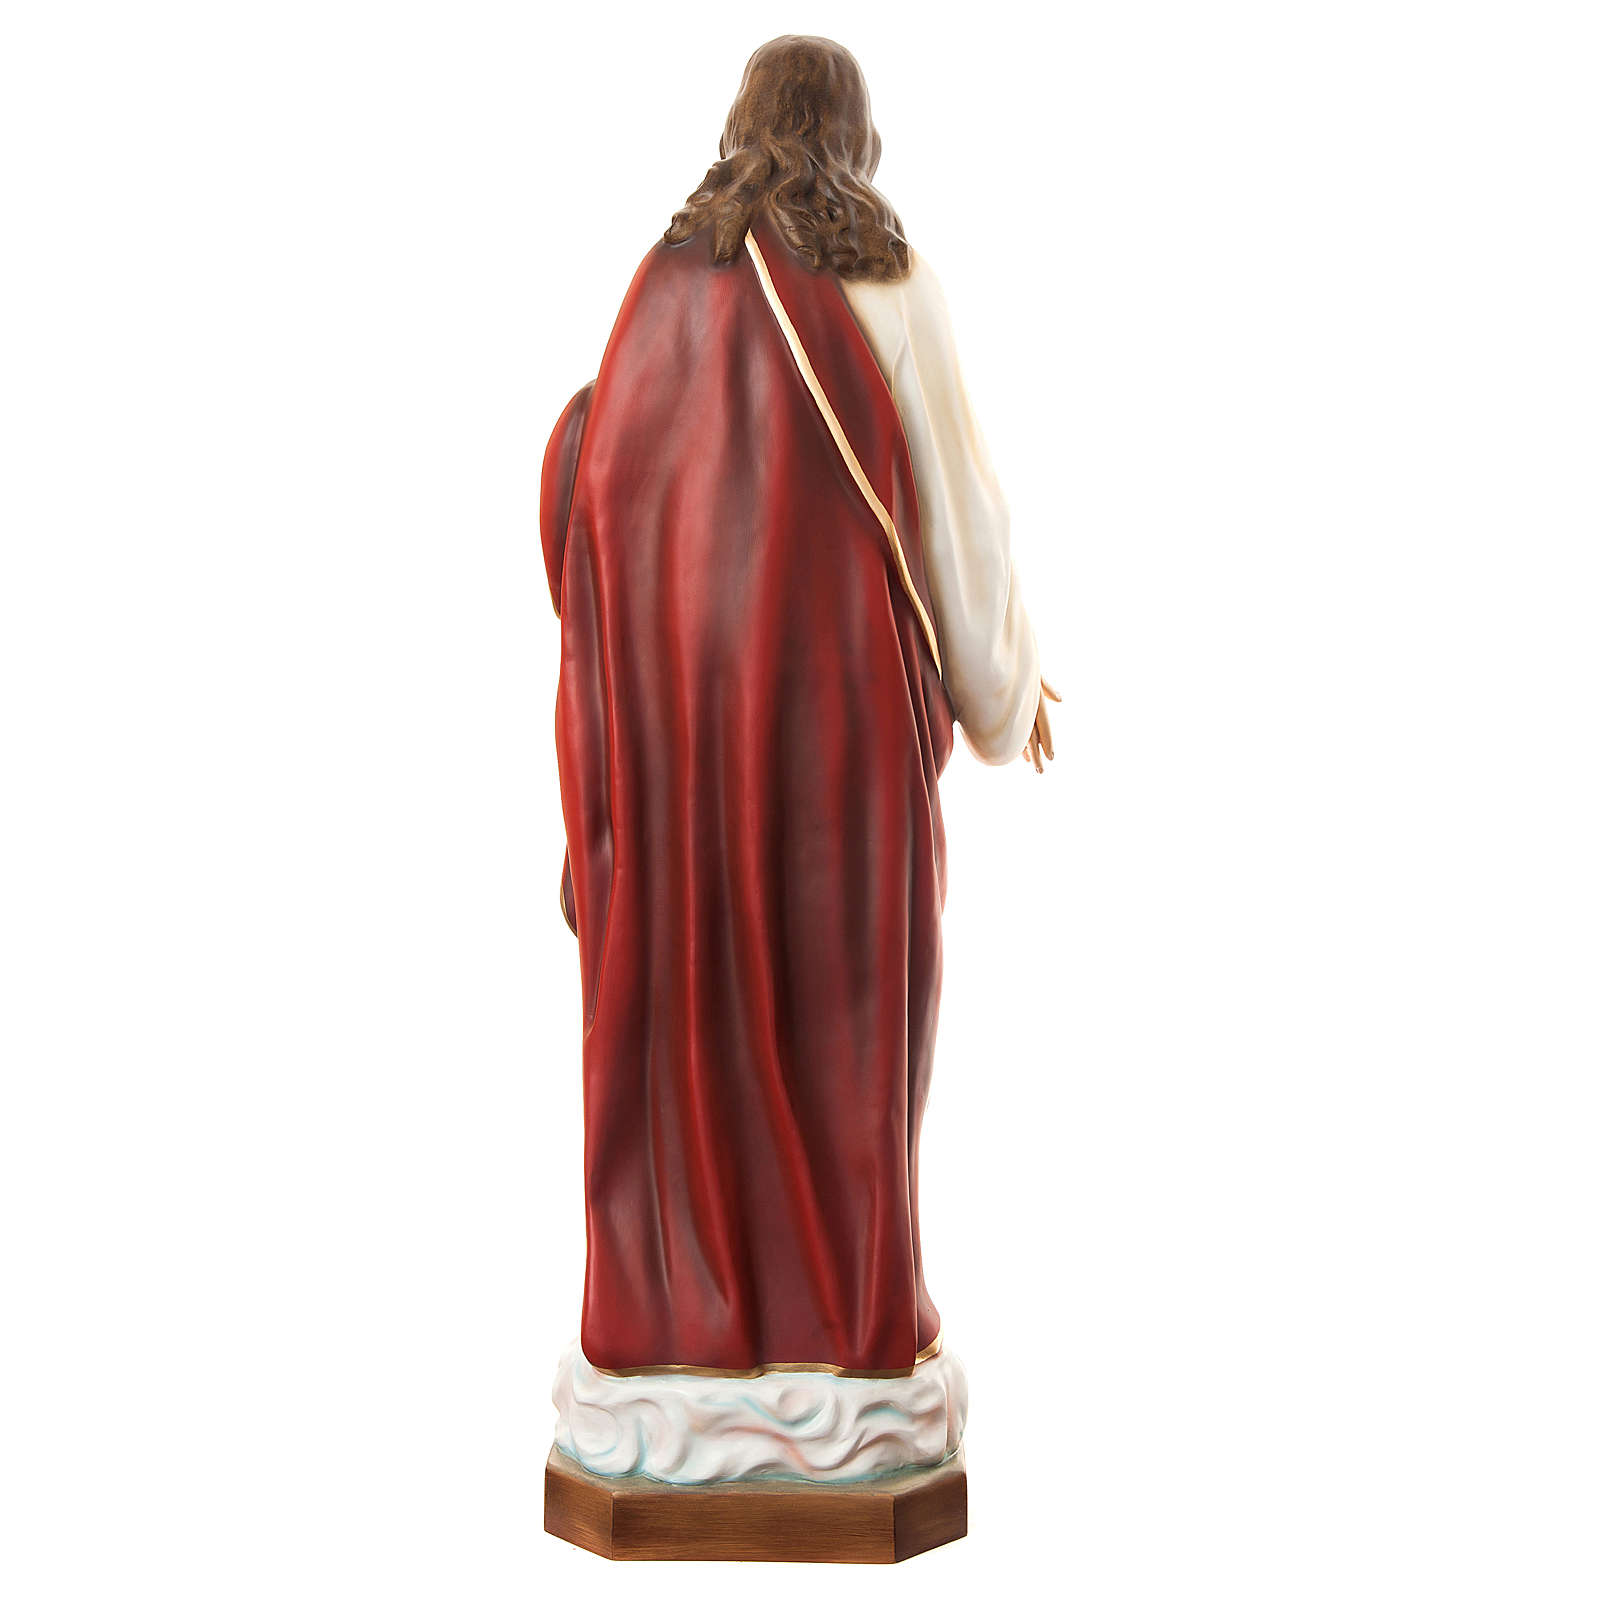 Statua Sacro Cuore di Gesù 180 cm vetroresina dipinta PER ESTERNO 4